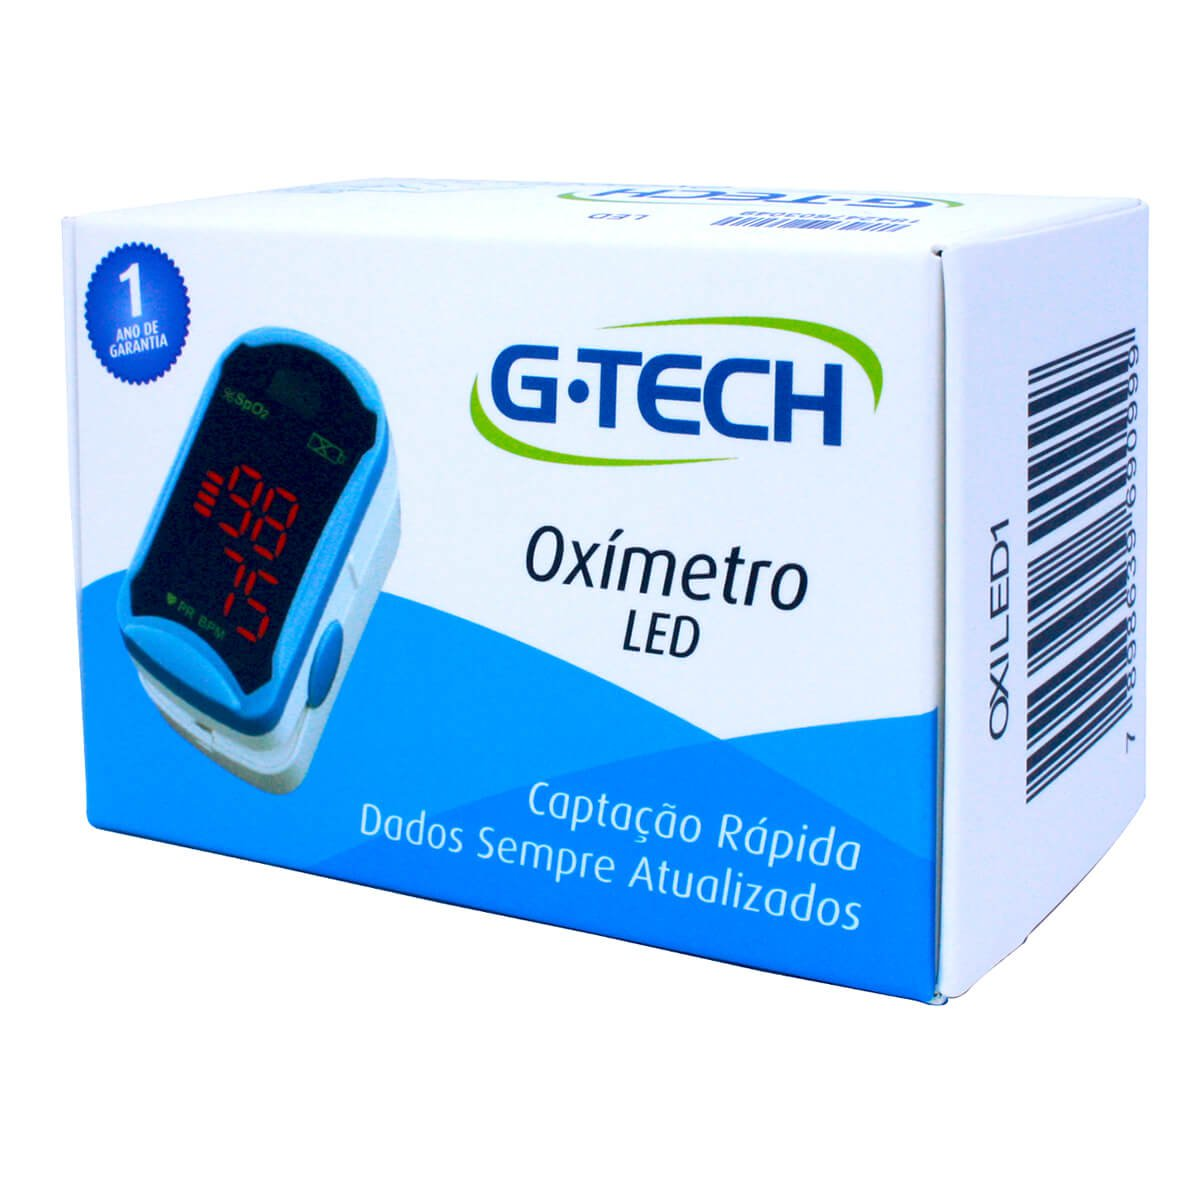 Oxímetro LED  G-Tech